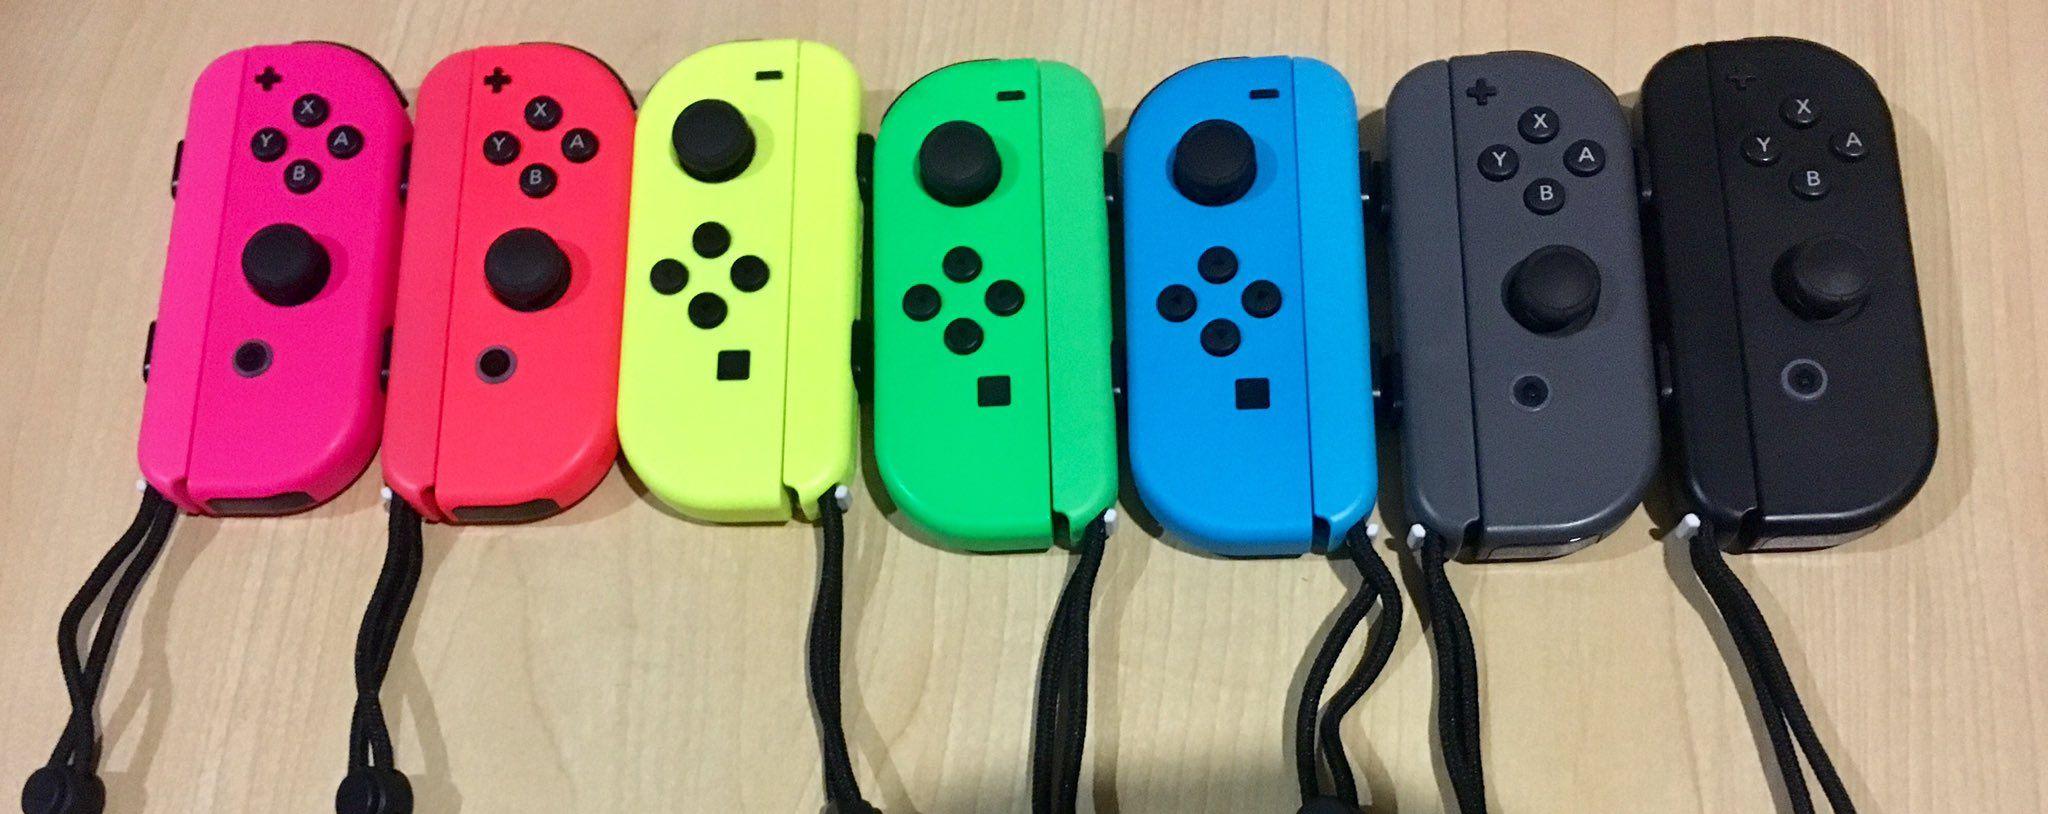 James Montagna on | Geek | Nintendo switch, Nintendo wii